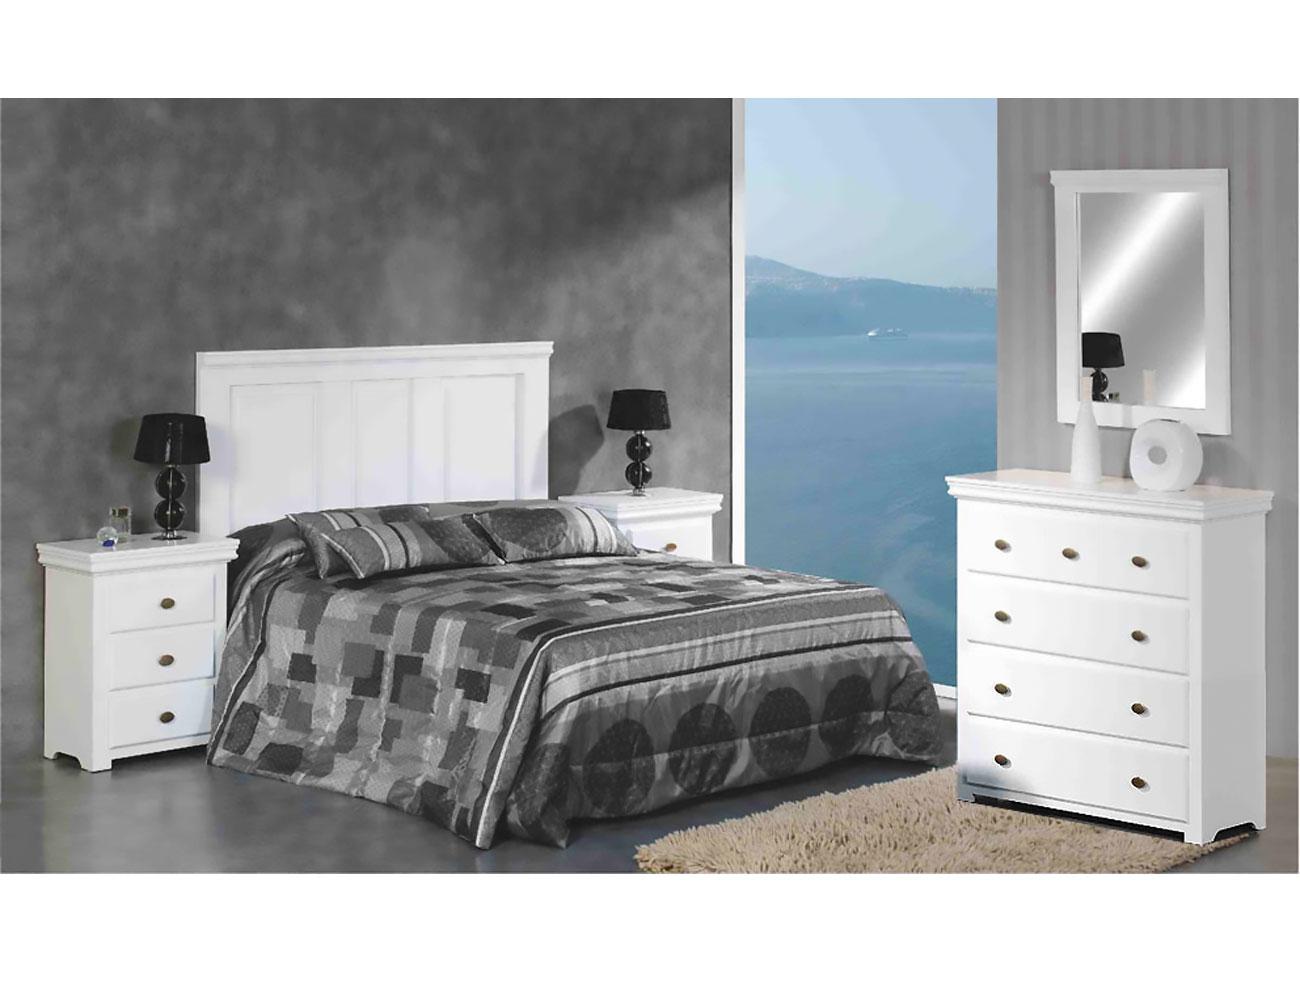 Dormitorio matrimonio comoda 5 c madera dm lacado blanco13